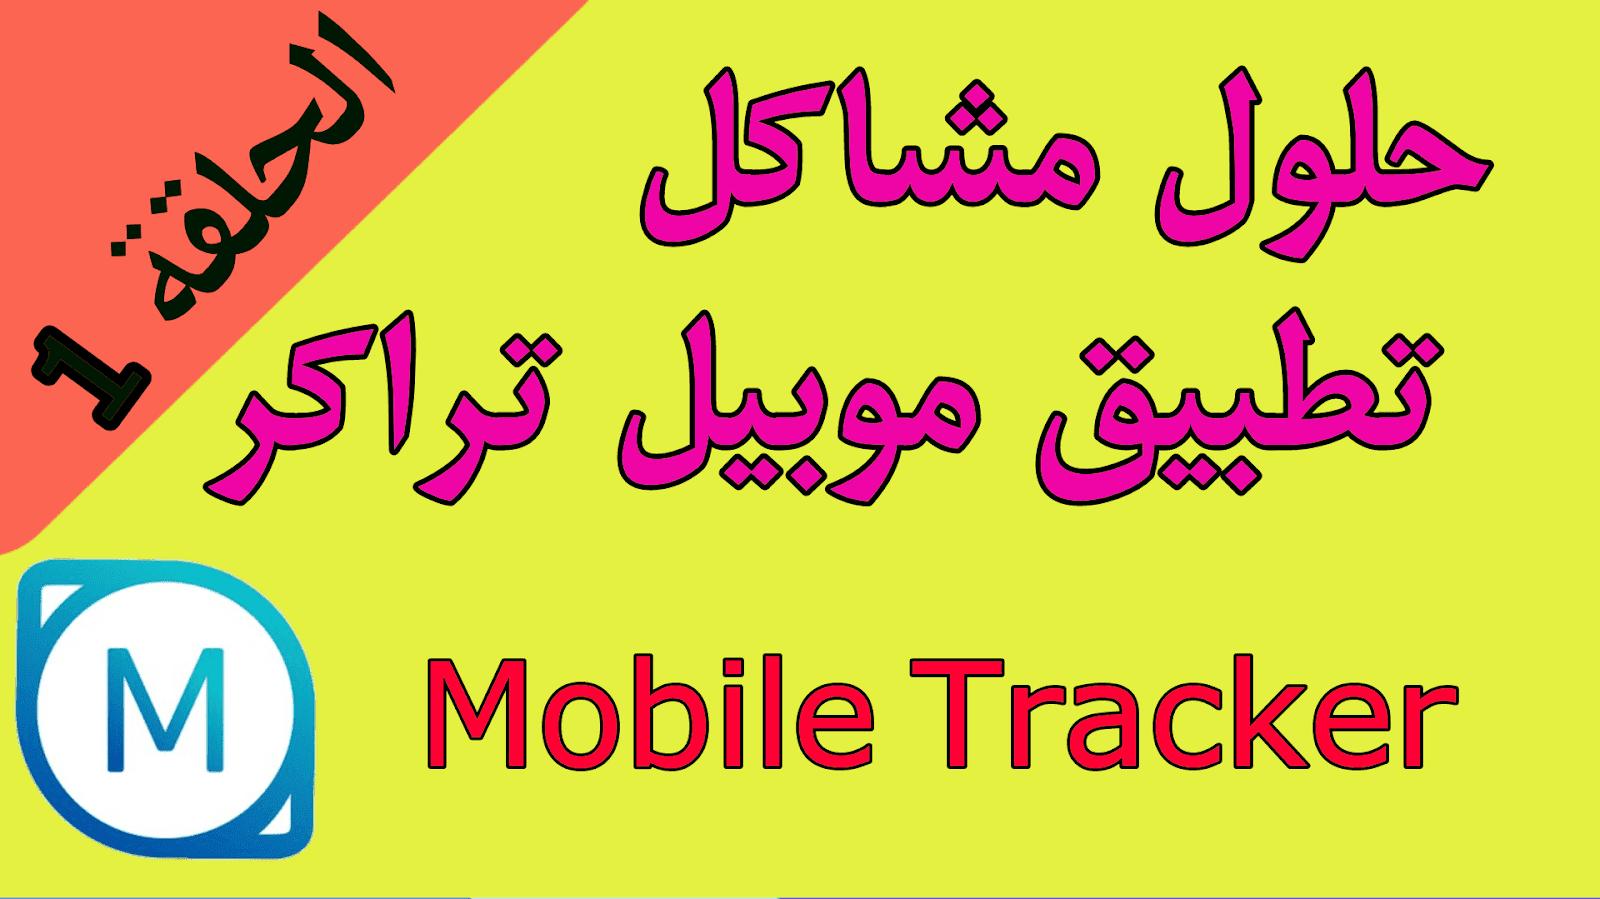 Mobile Traker chabah FB - Phoonex